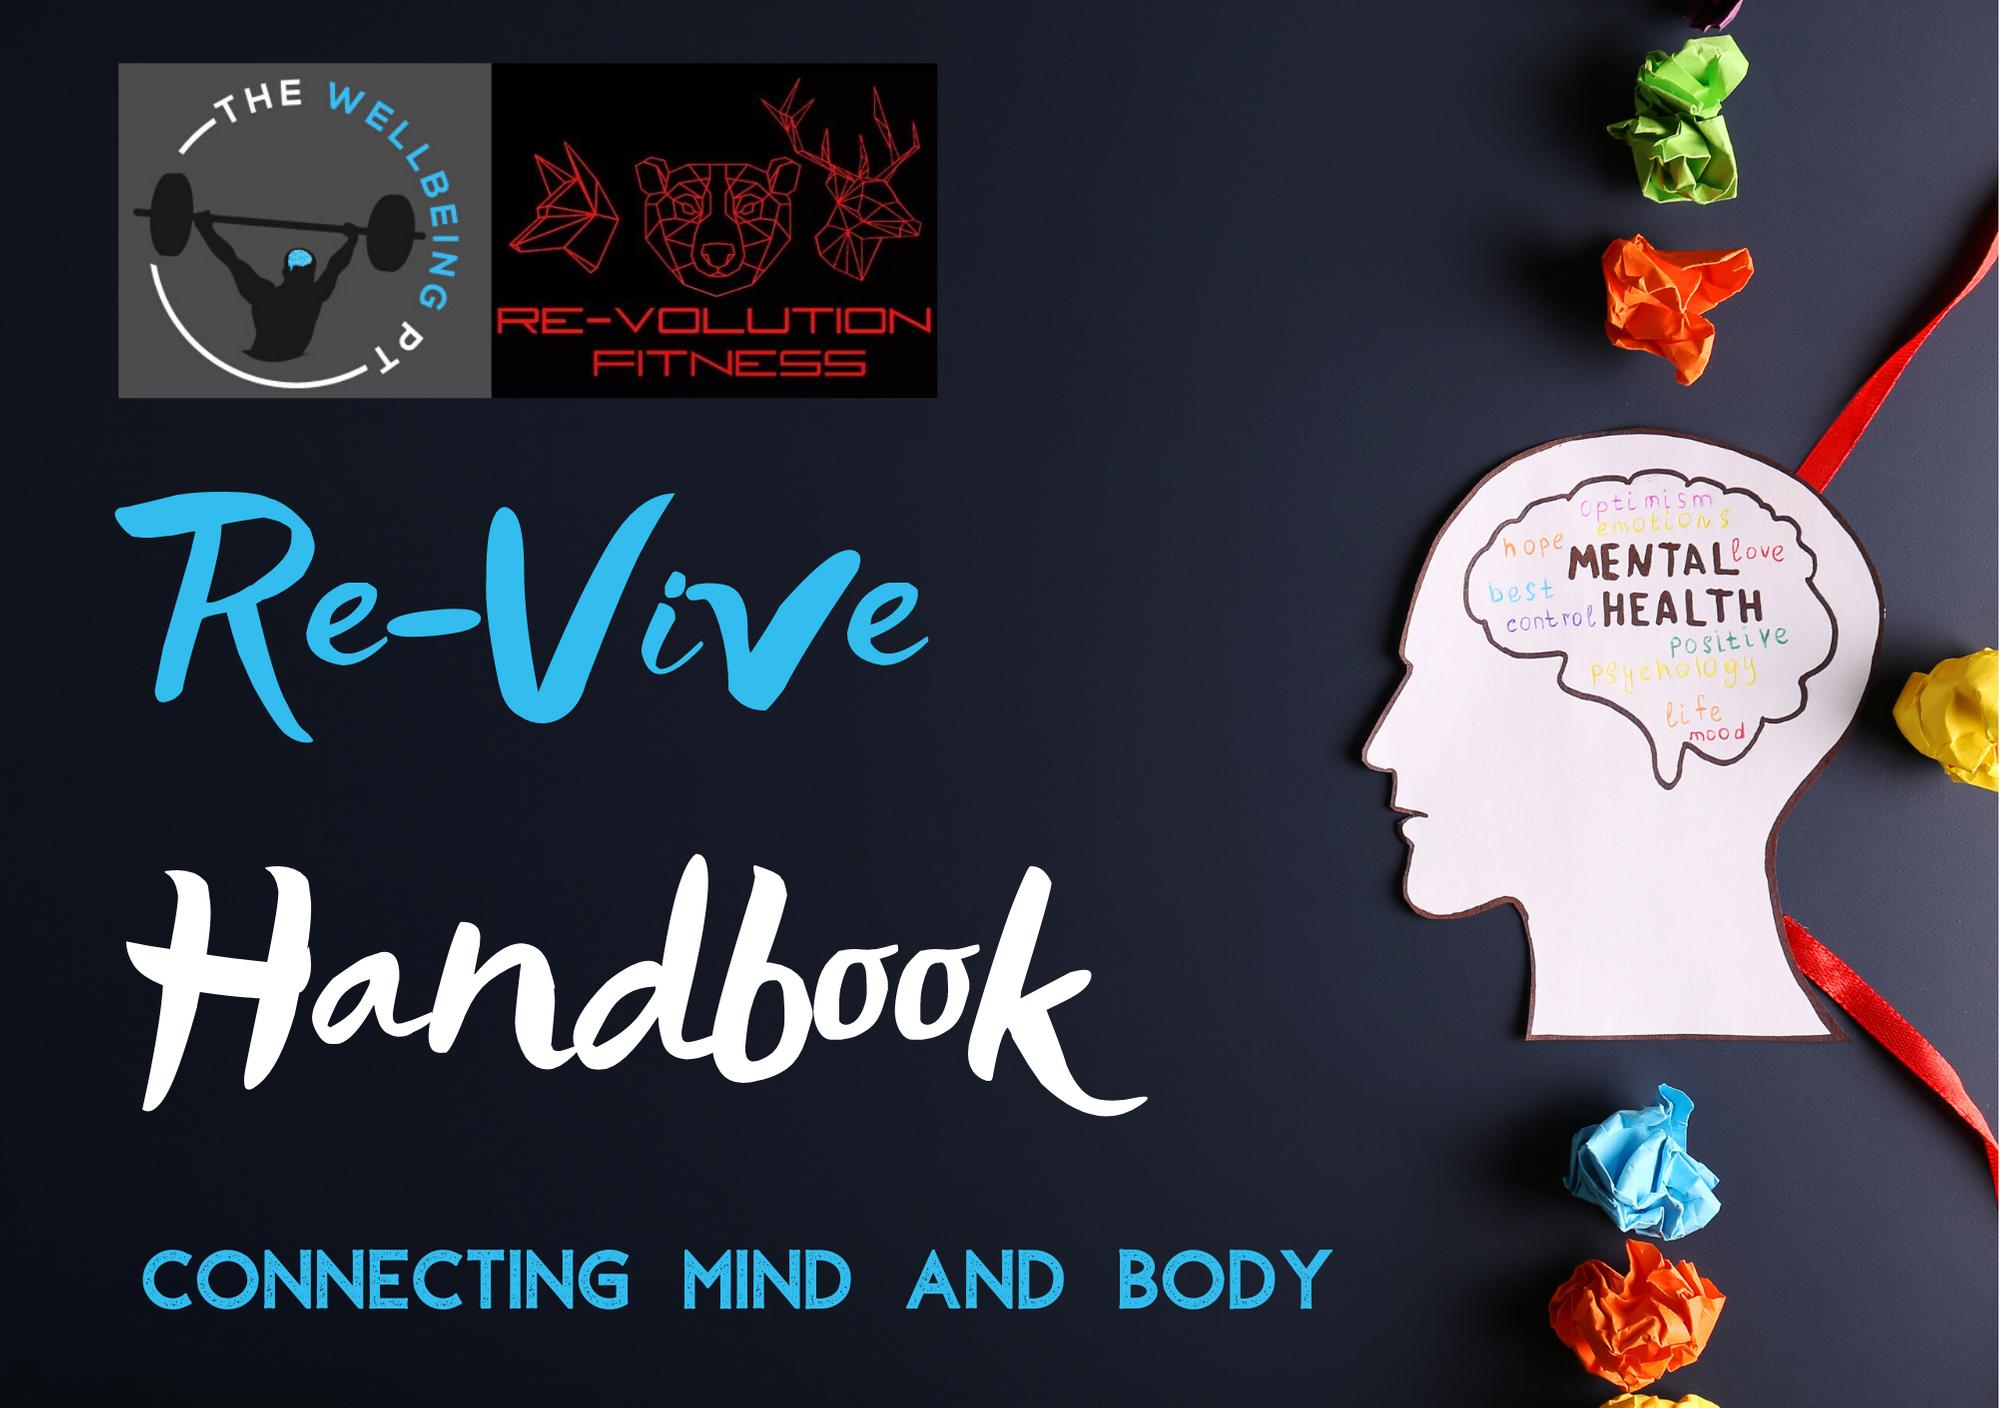 Re-Vive Handbook (2)